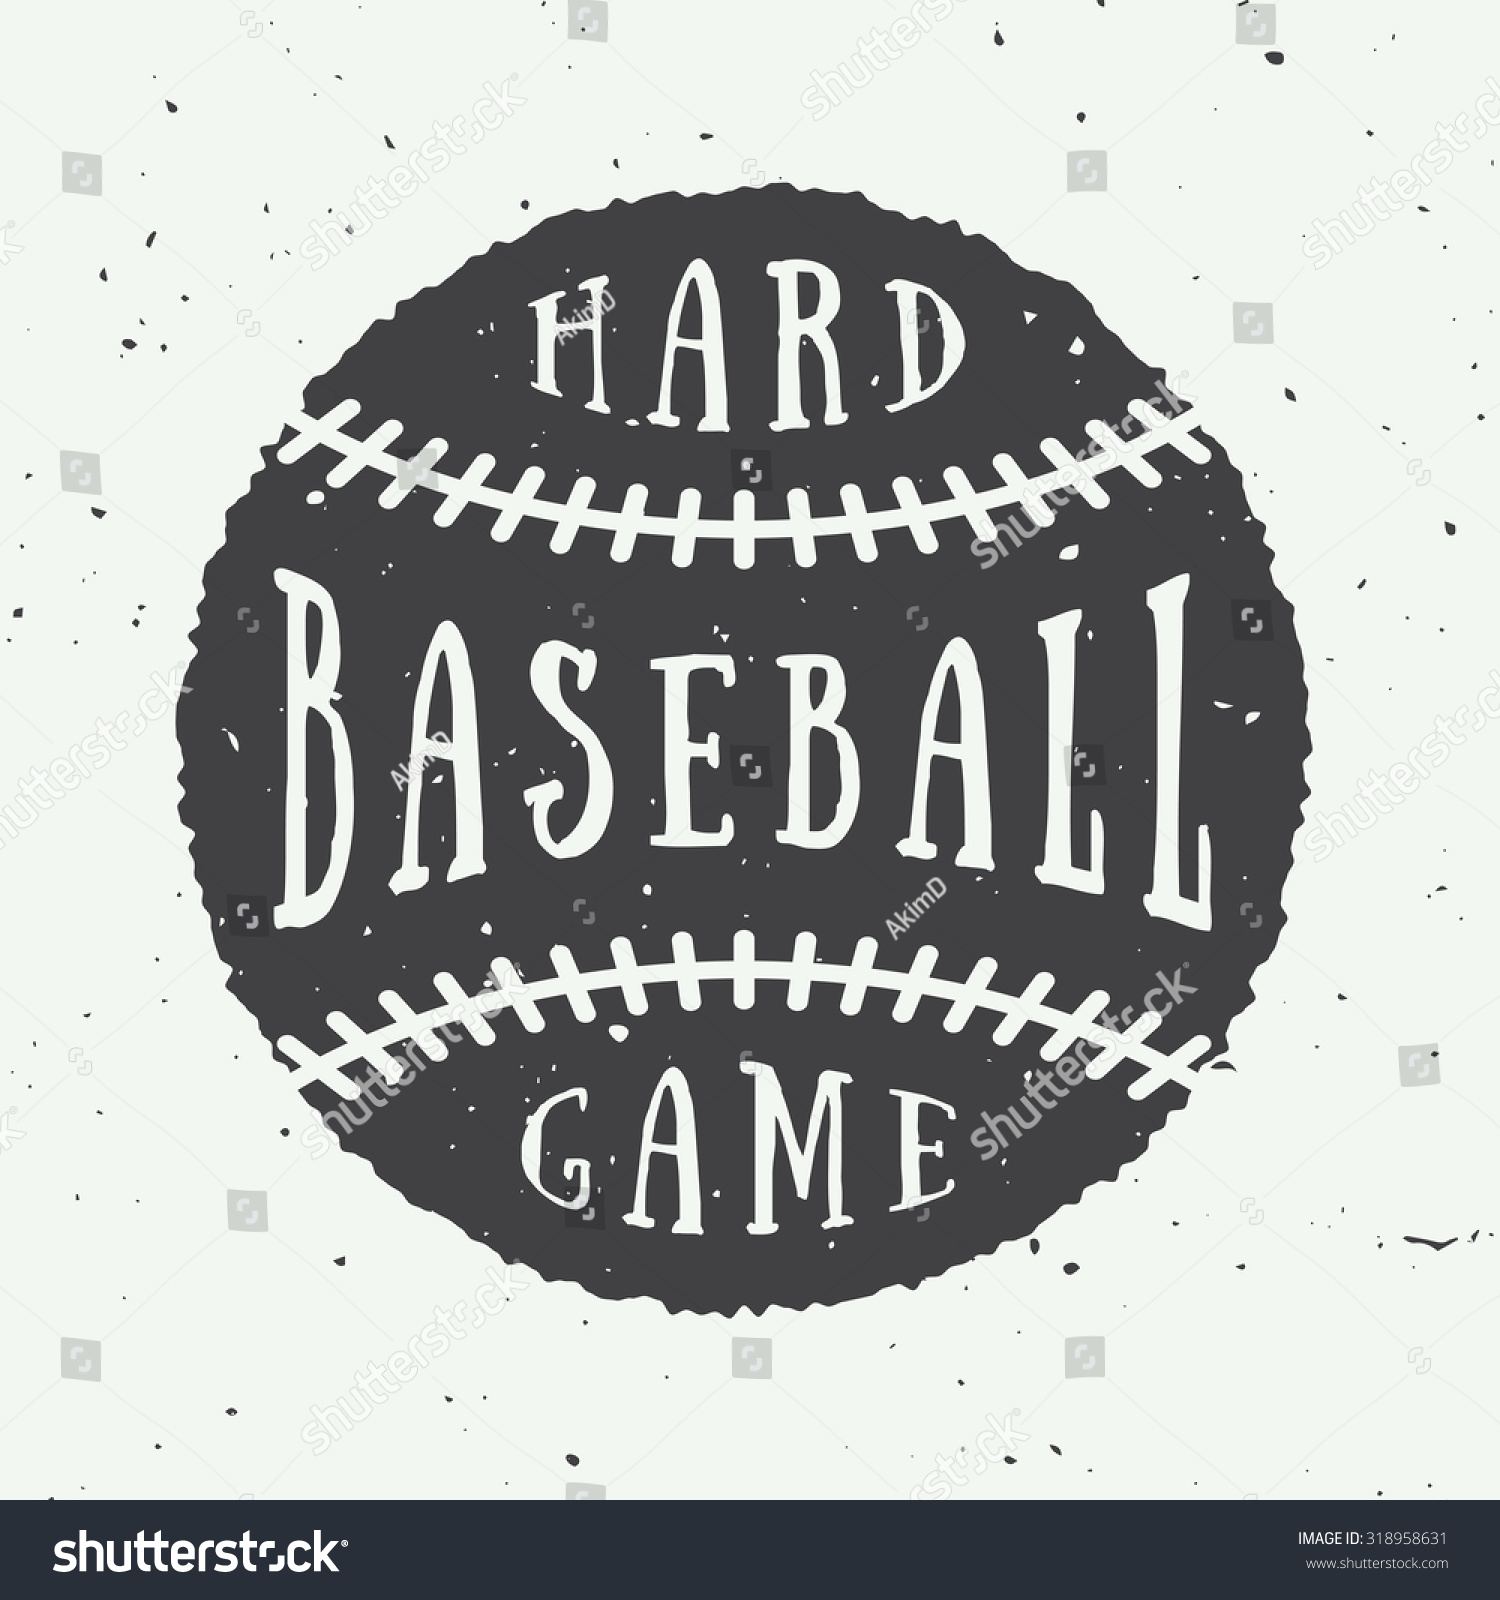 stock-vector-vintage-baseball-logo-emblem-badge-vector-illustration-318958631.jpg